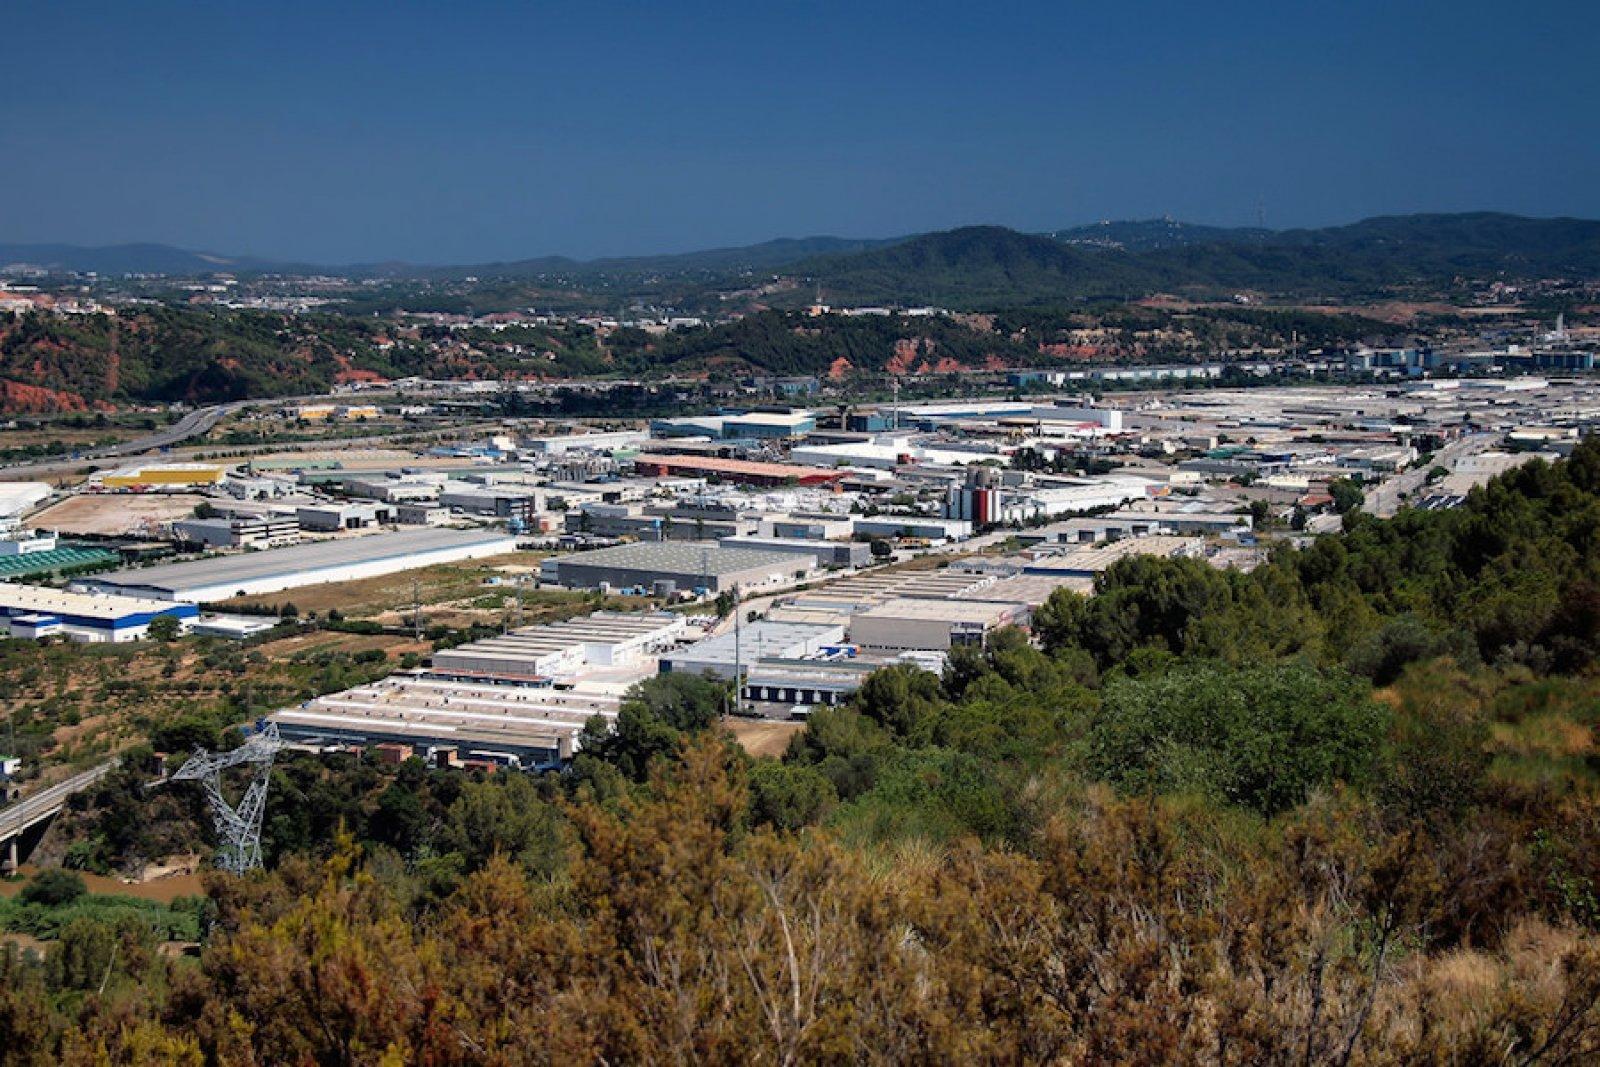 Polígon industrial Aquiberia de Martorell